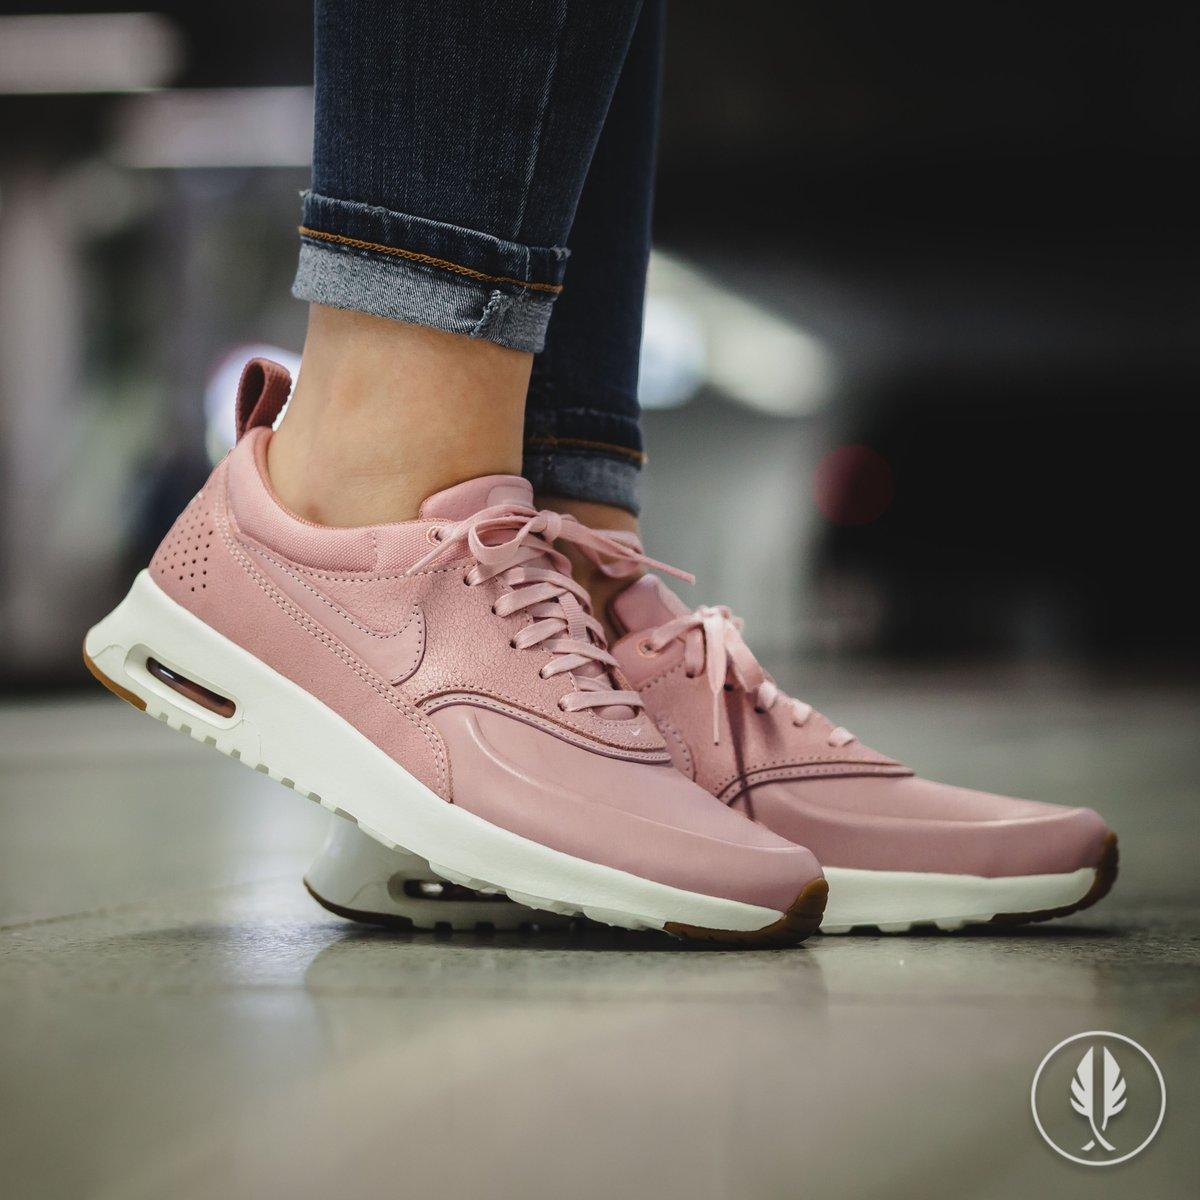 Nike WMNS Air Max Thea Premium Pink Glaze | Calzado nike